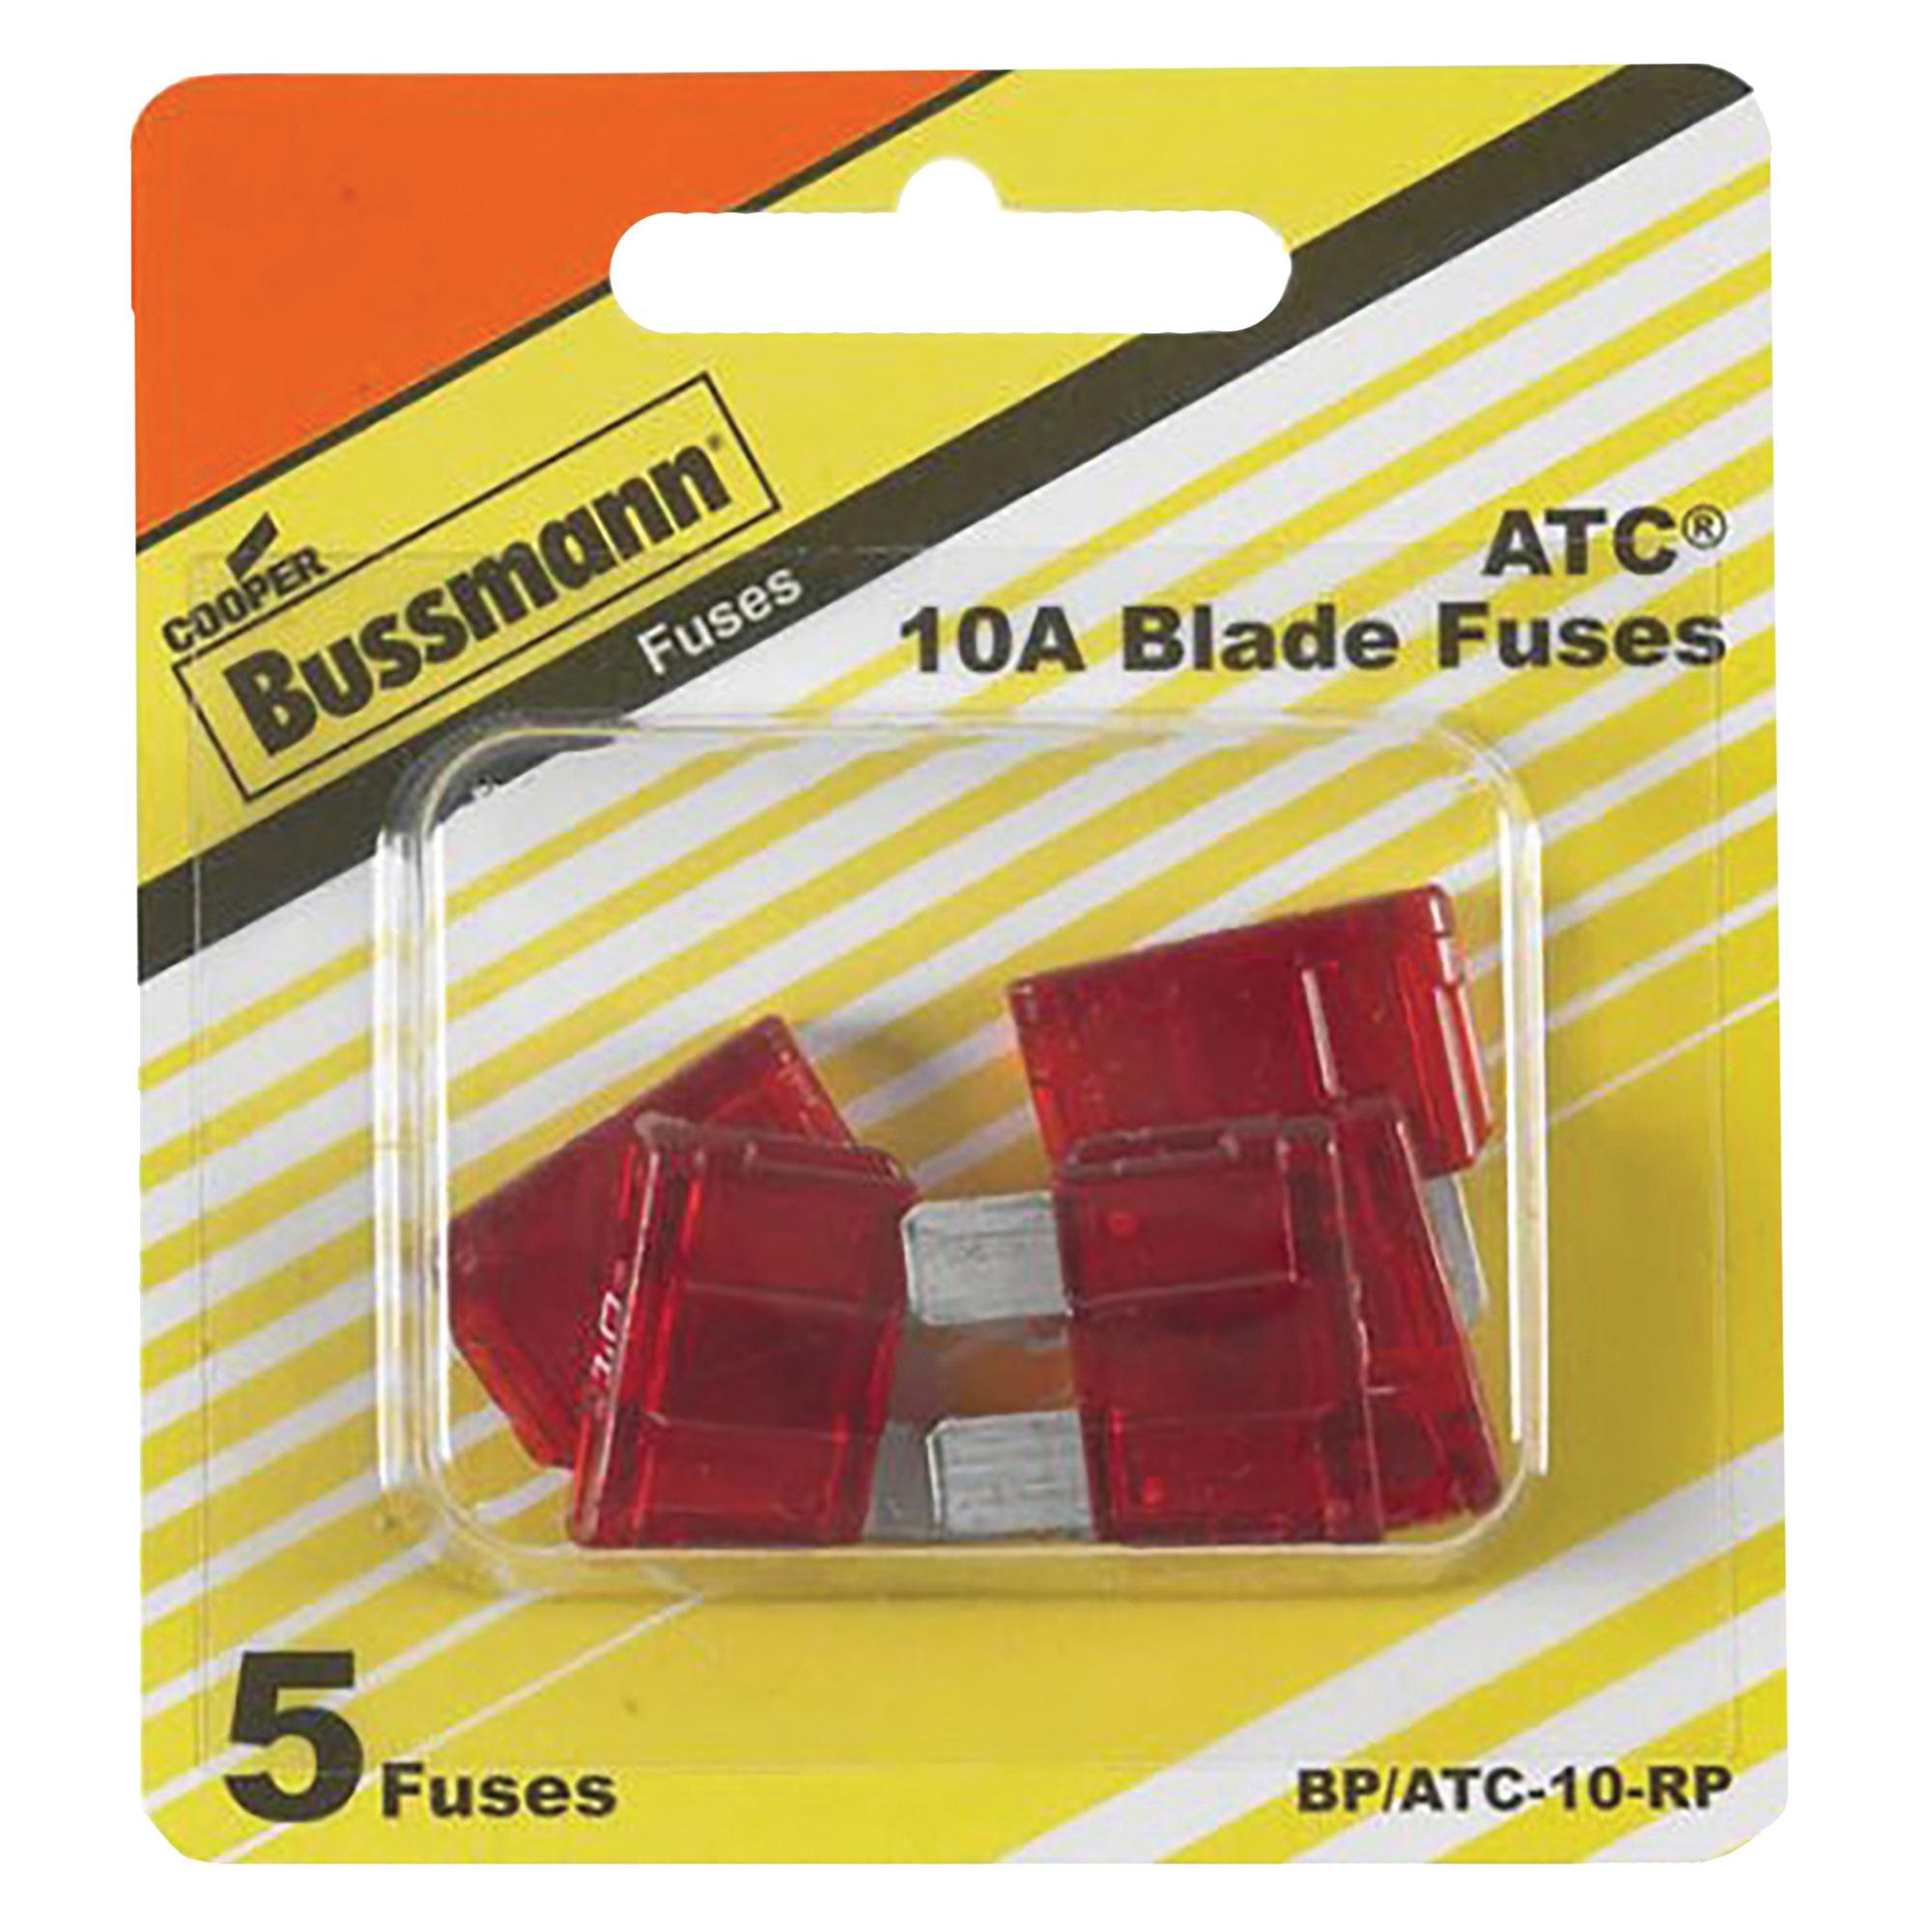 Bussmann BP/ATC-10-RP